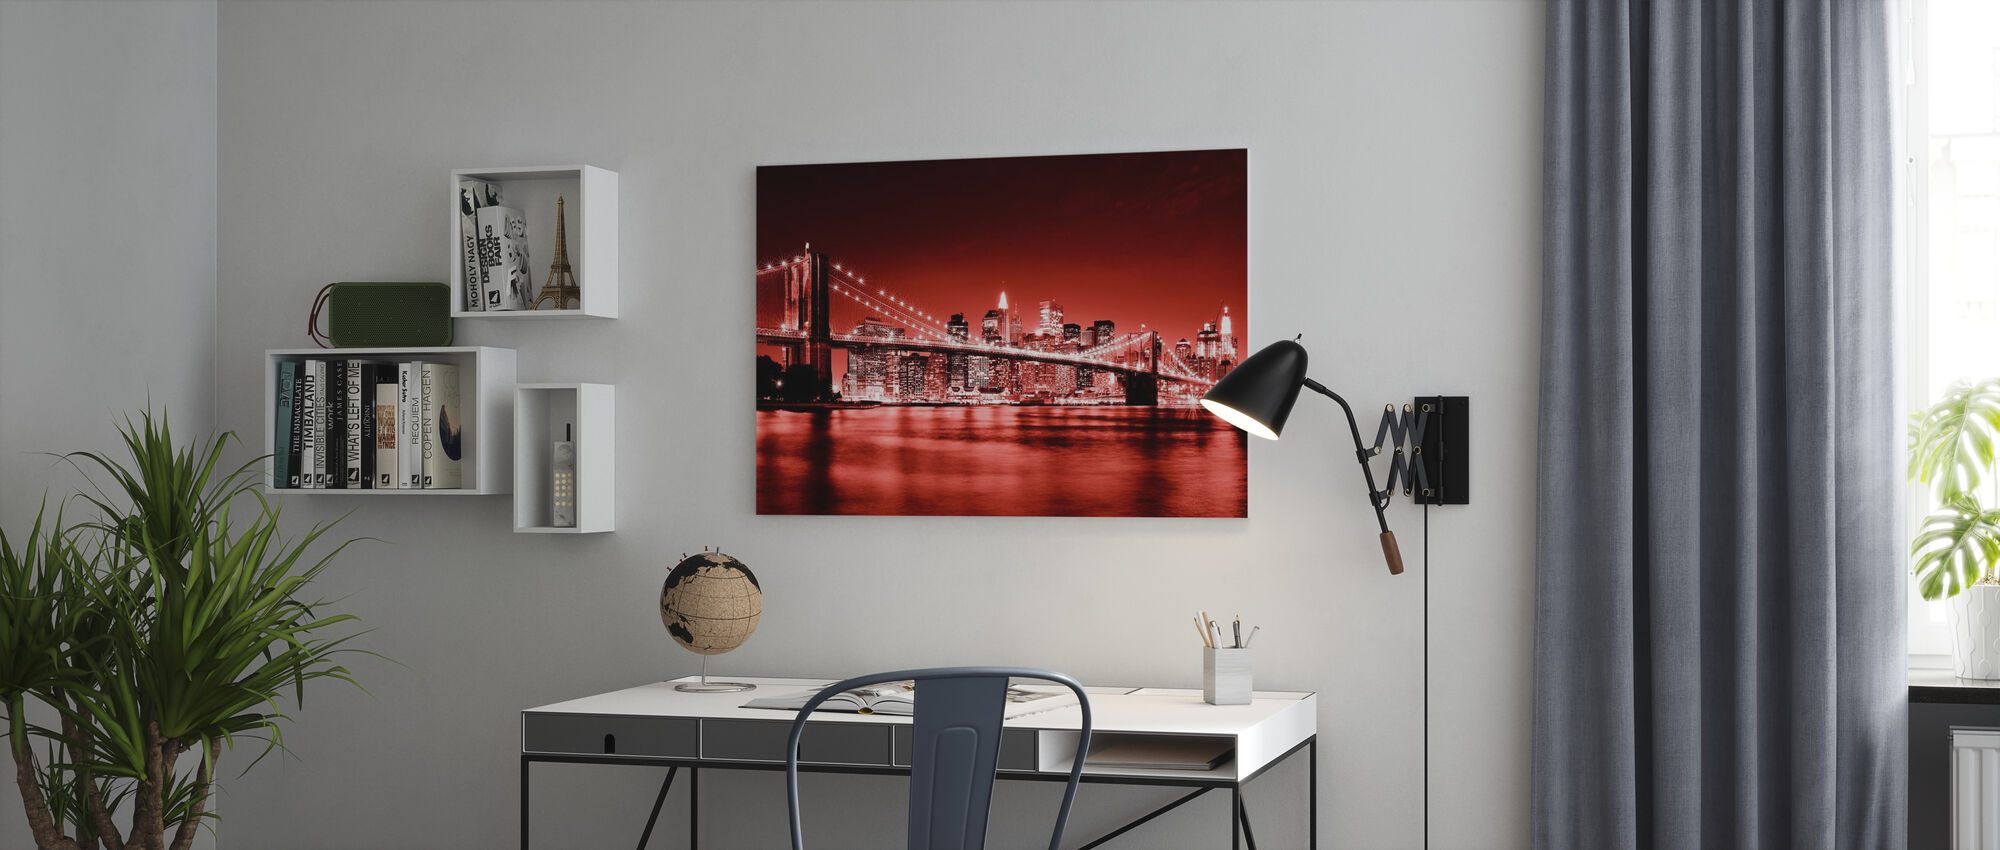 Brooklyn Bridge - Rood - Canvas print - Kantoor